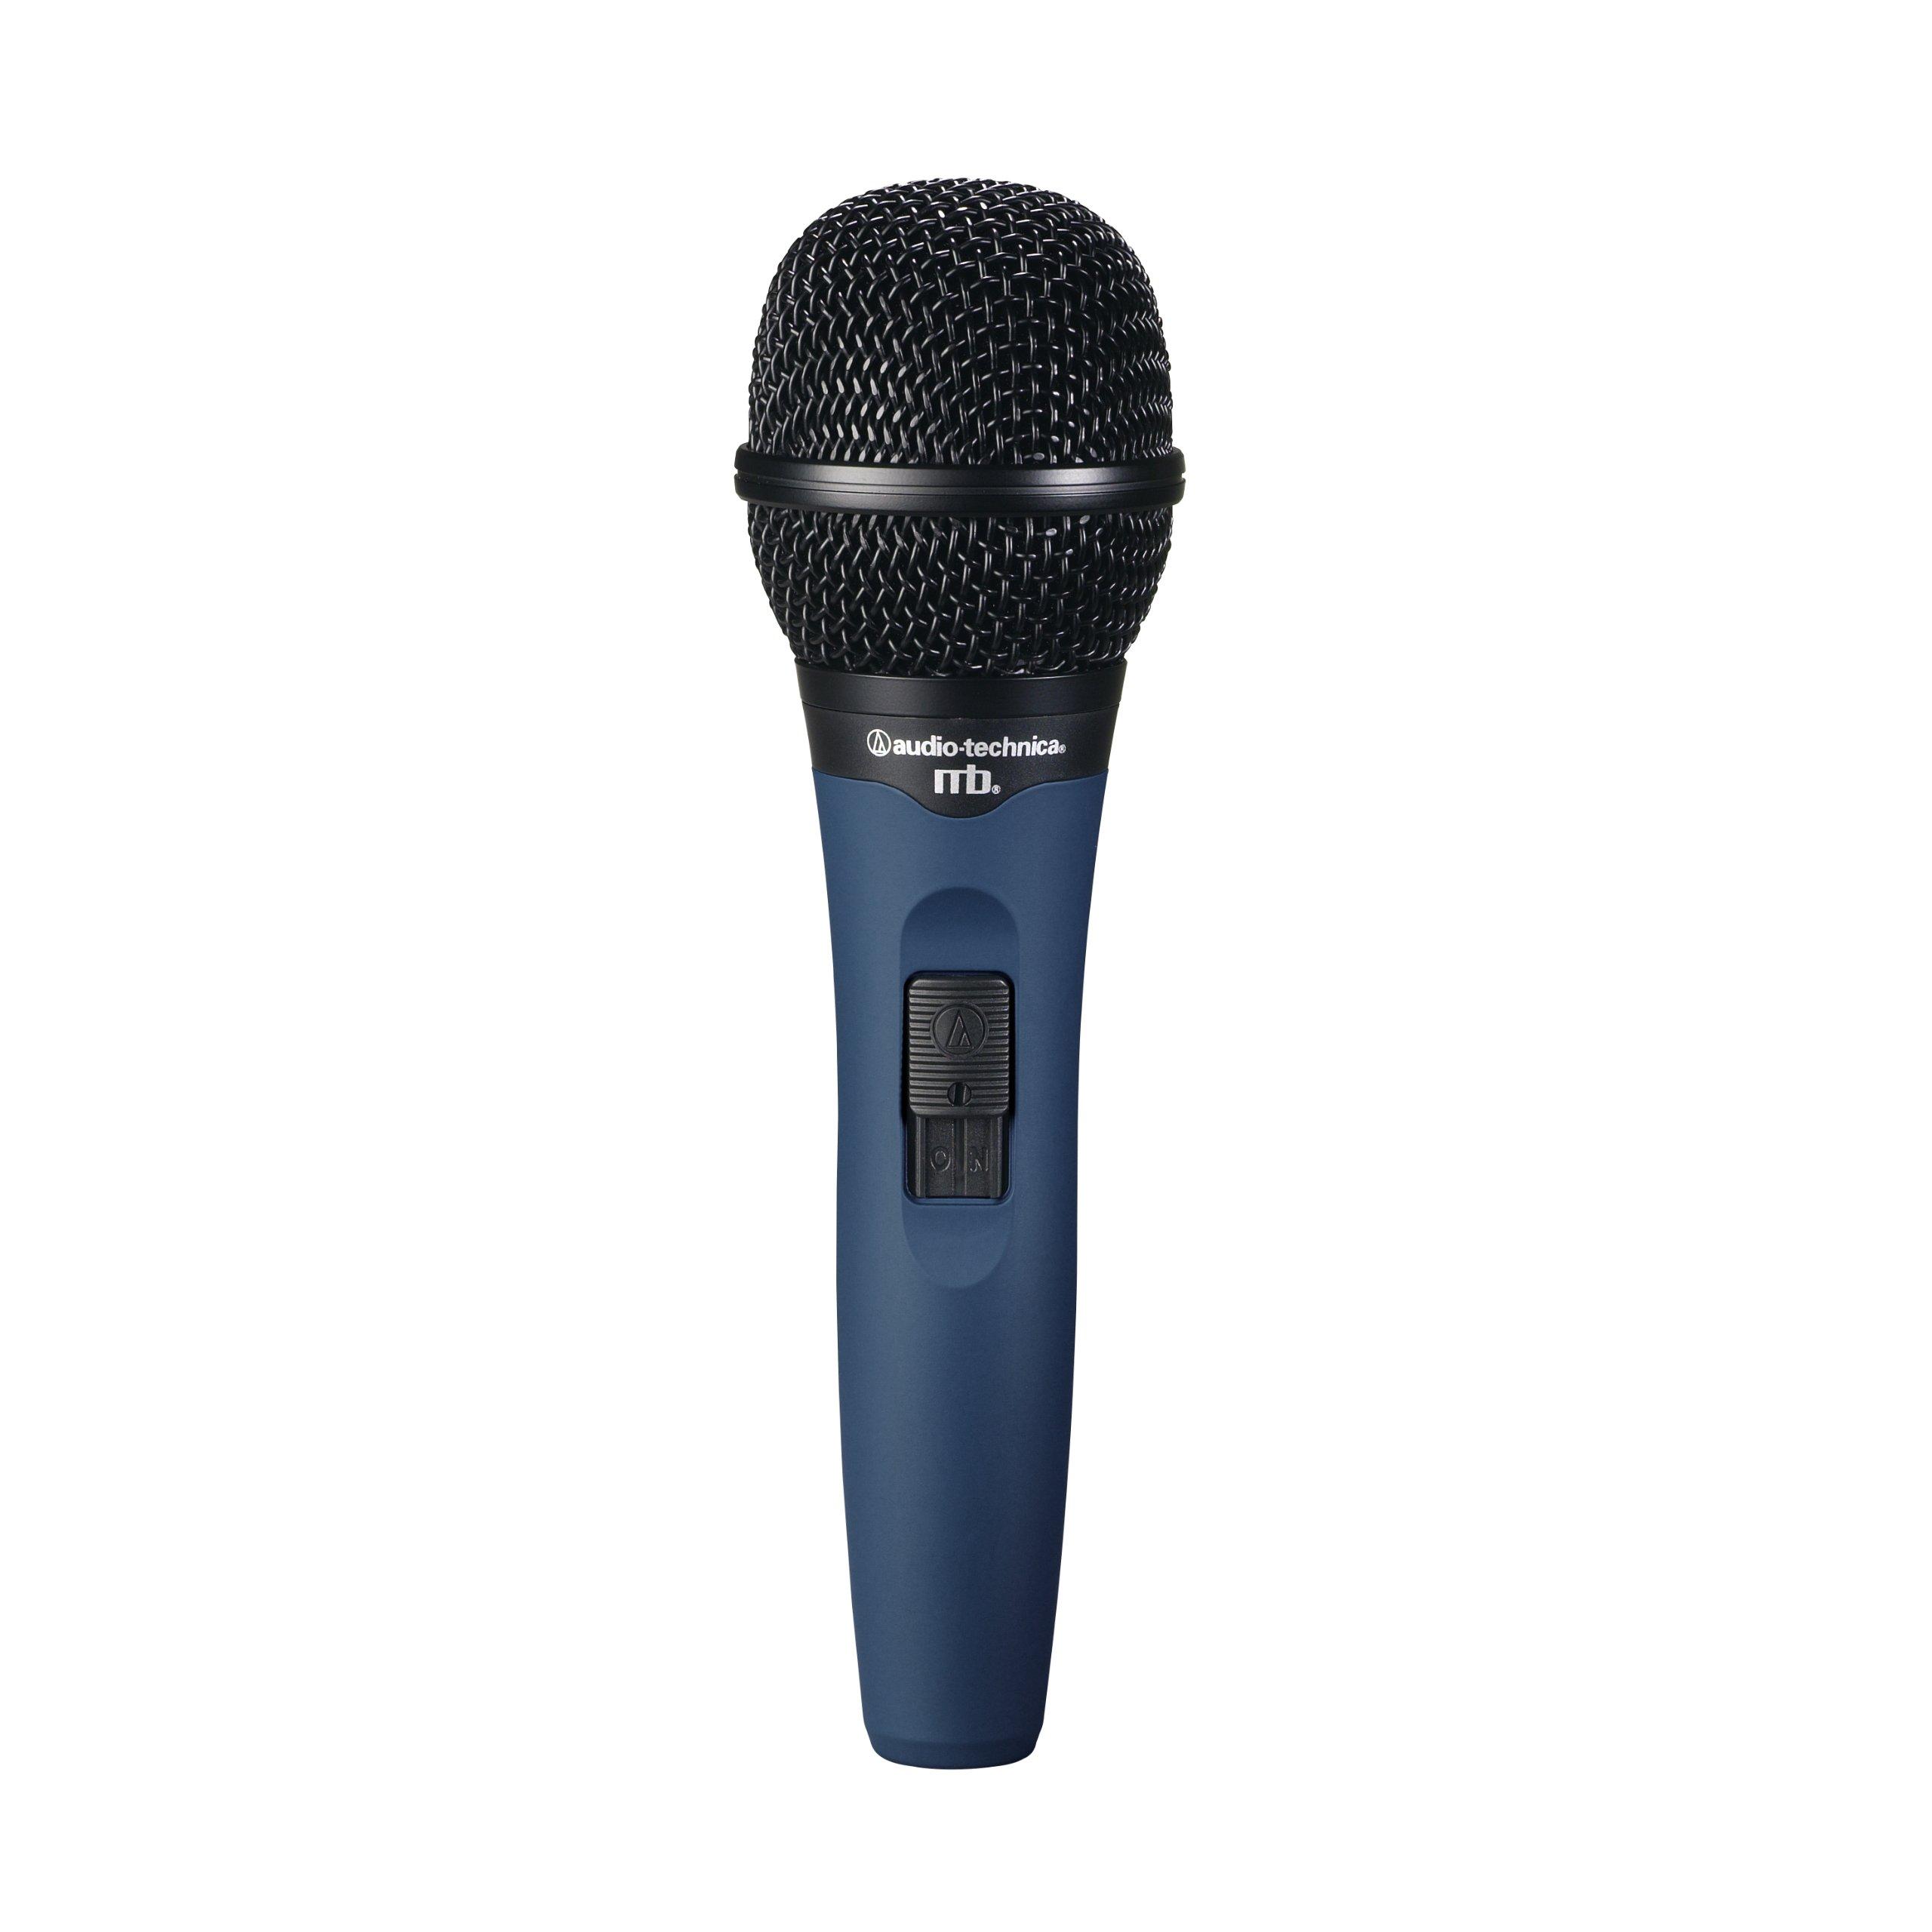 Microfono Audio-technica Mb 3k Handheld Hypercardioid Dyn..